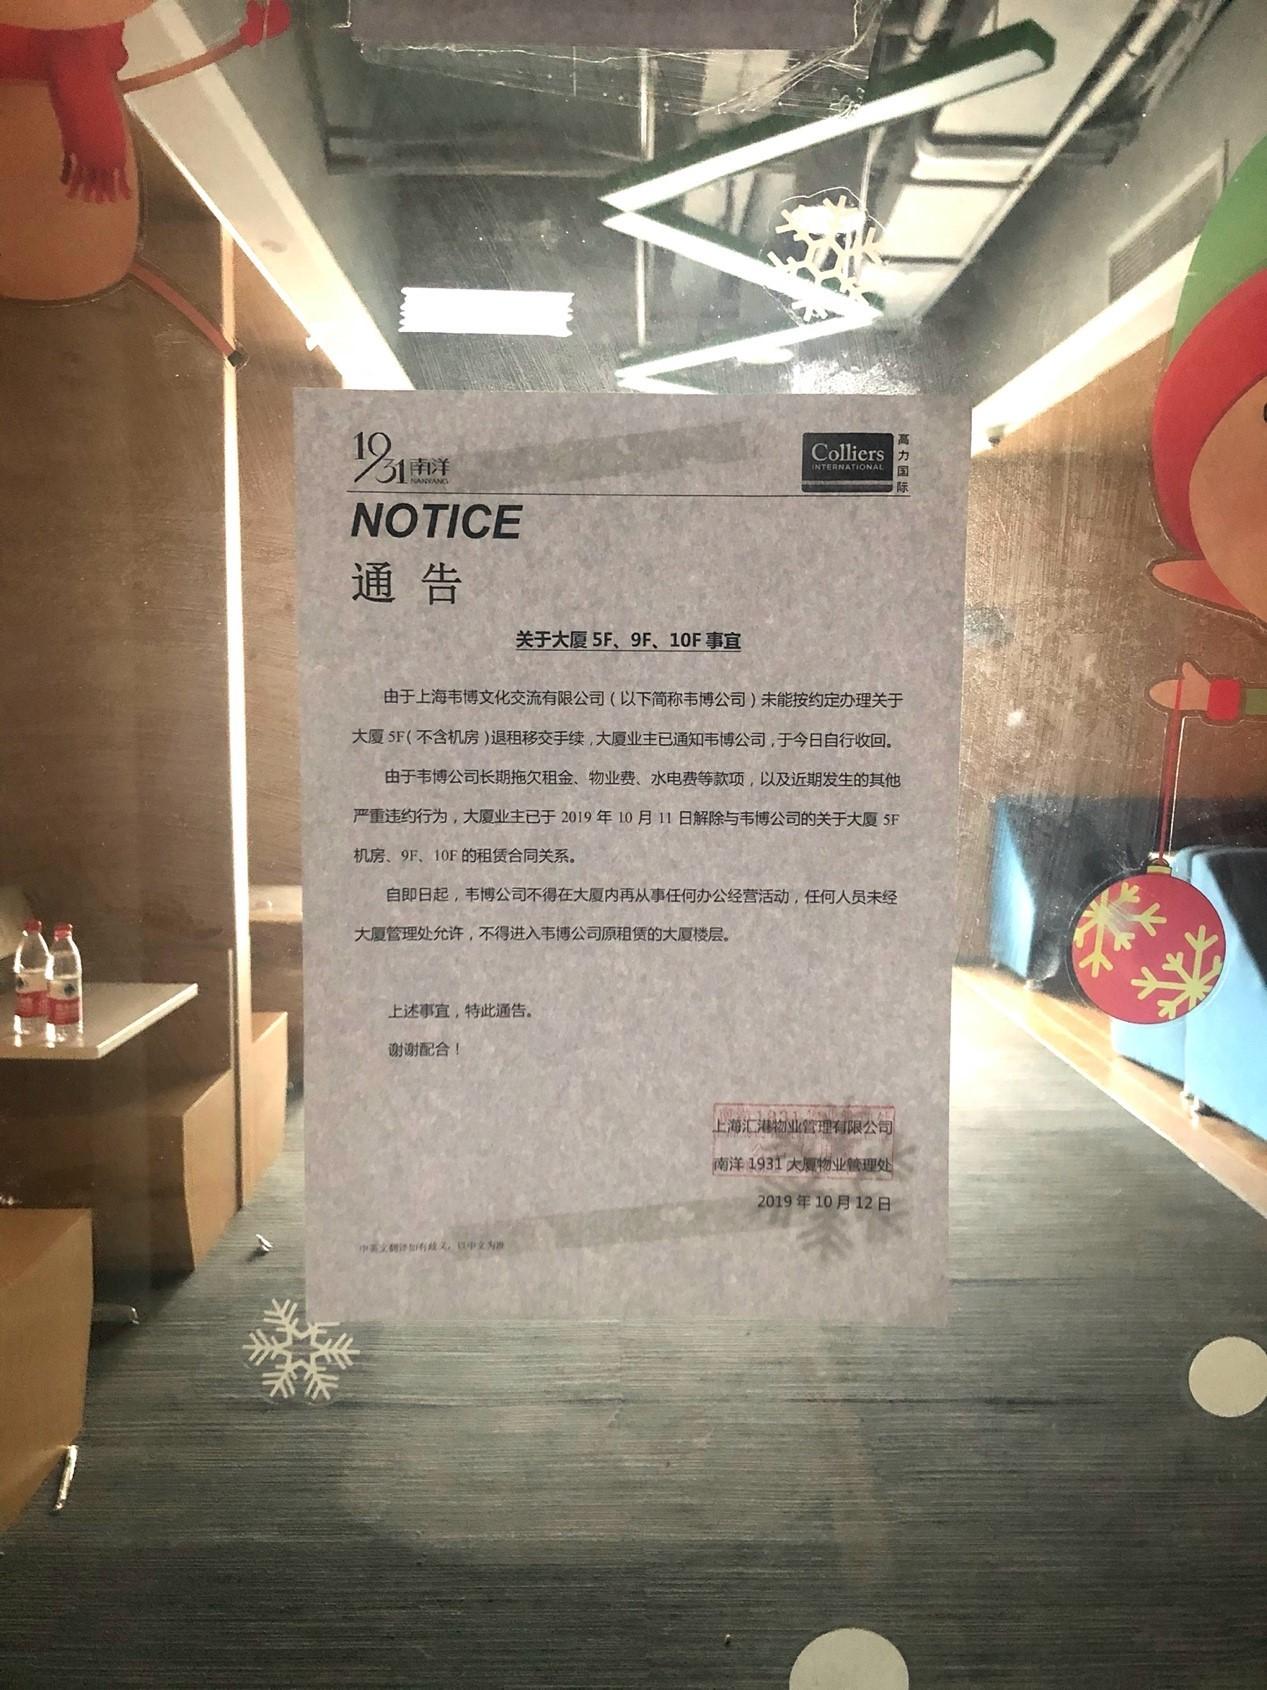 betdafa大发 - 顾雏军给江苏省委书记一封信:讨要扬州亚星客车股权